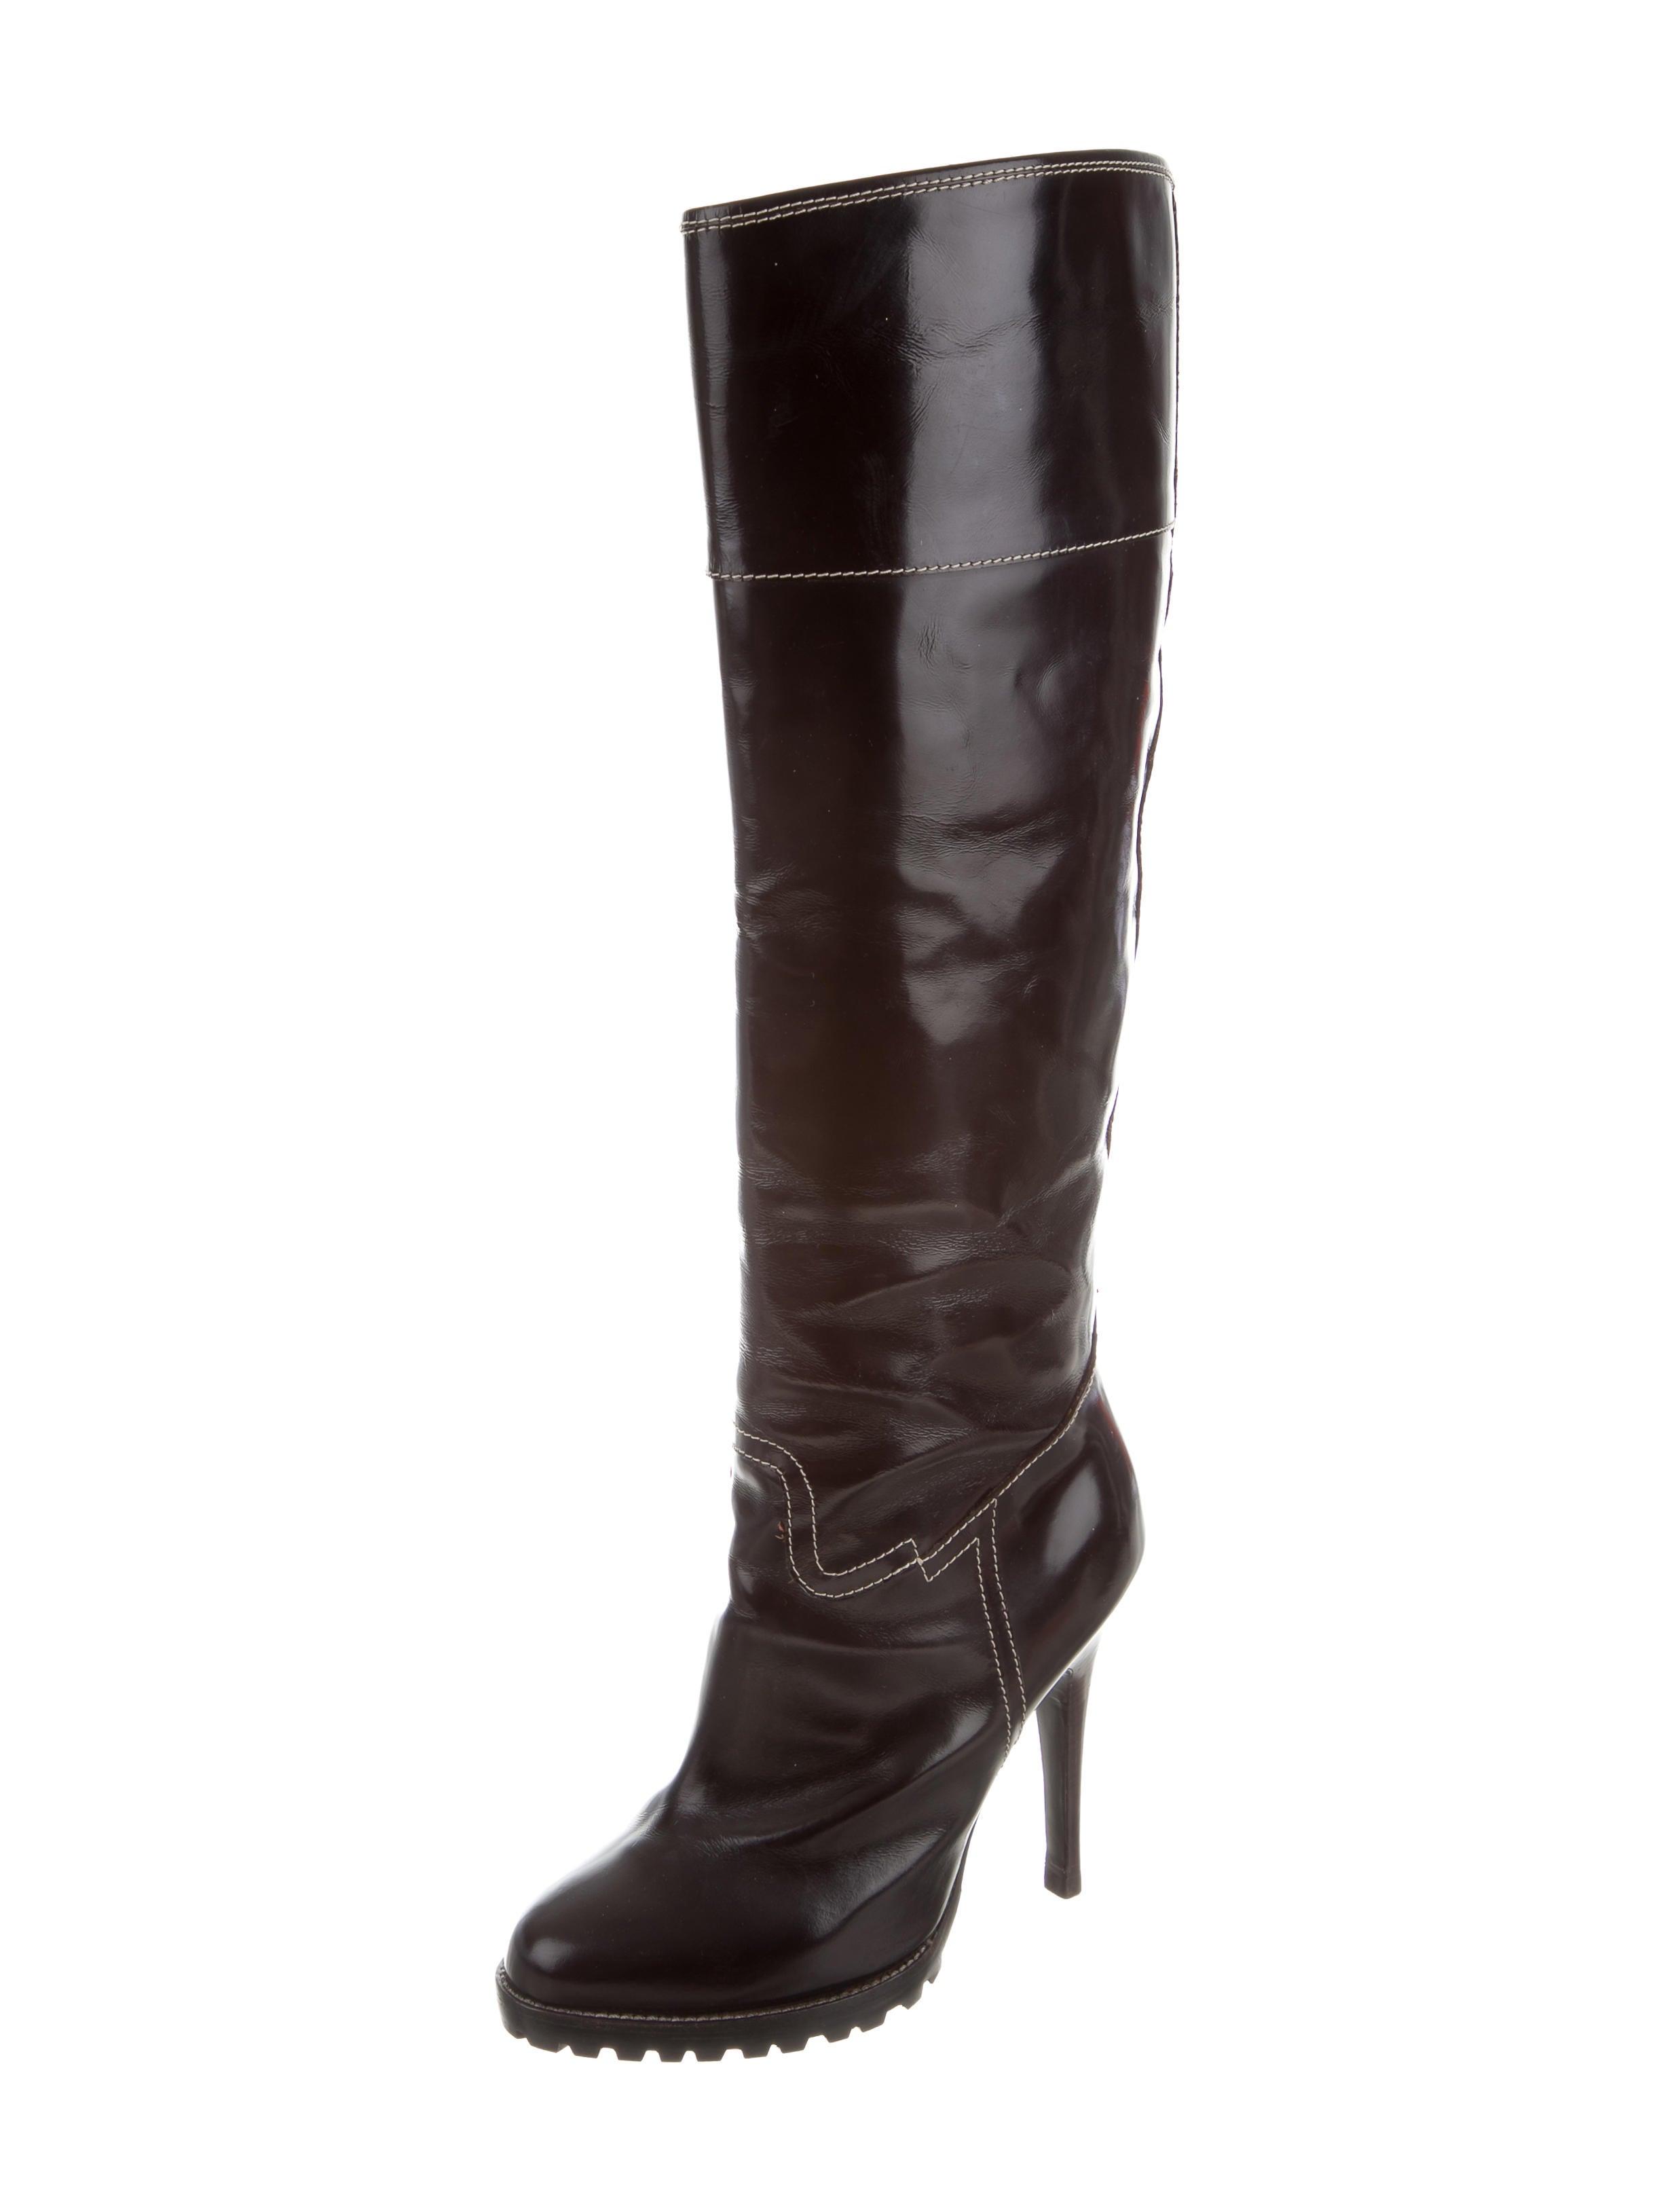 giuseppe zanotti patent knee high boots shoes giu35200